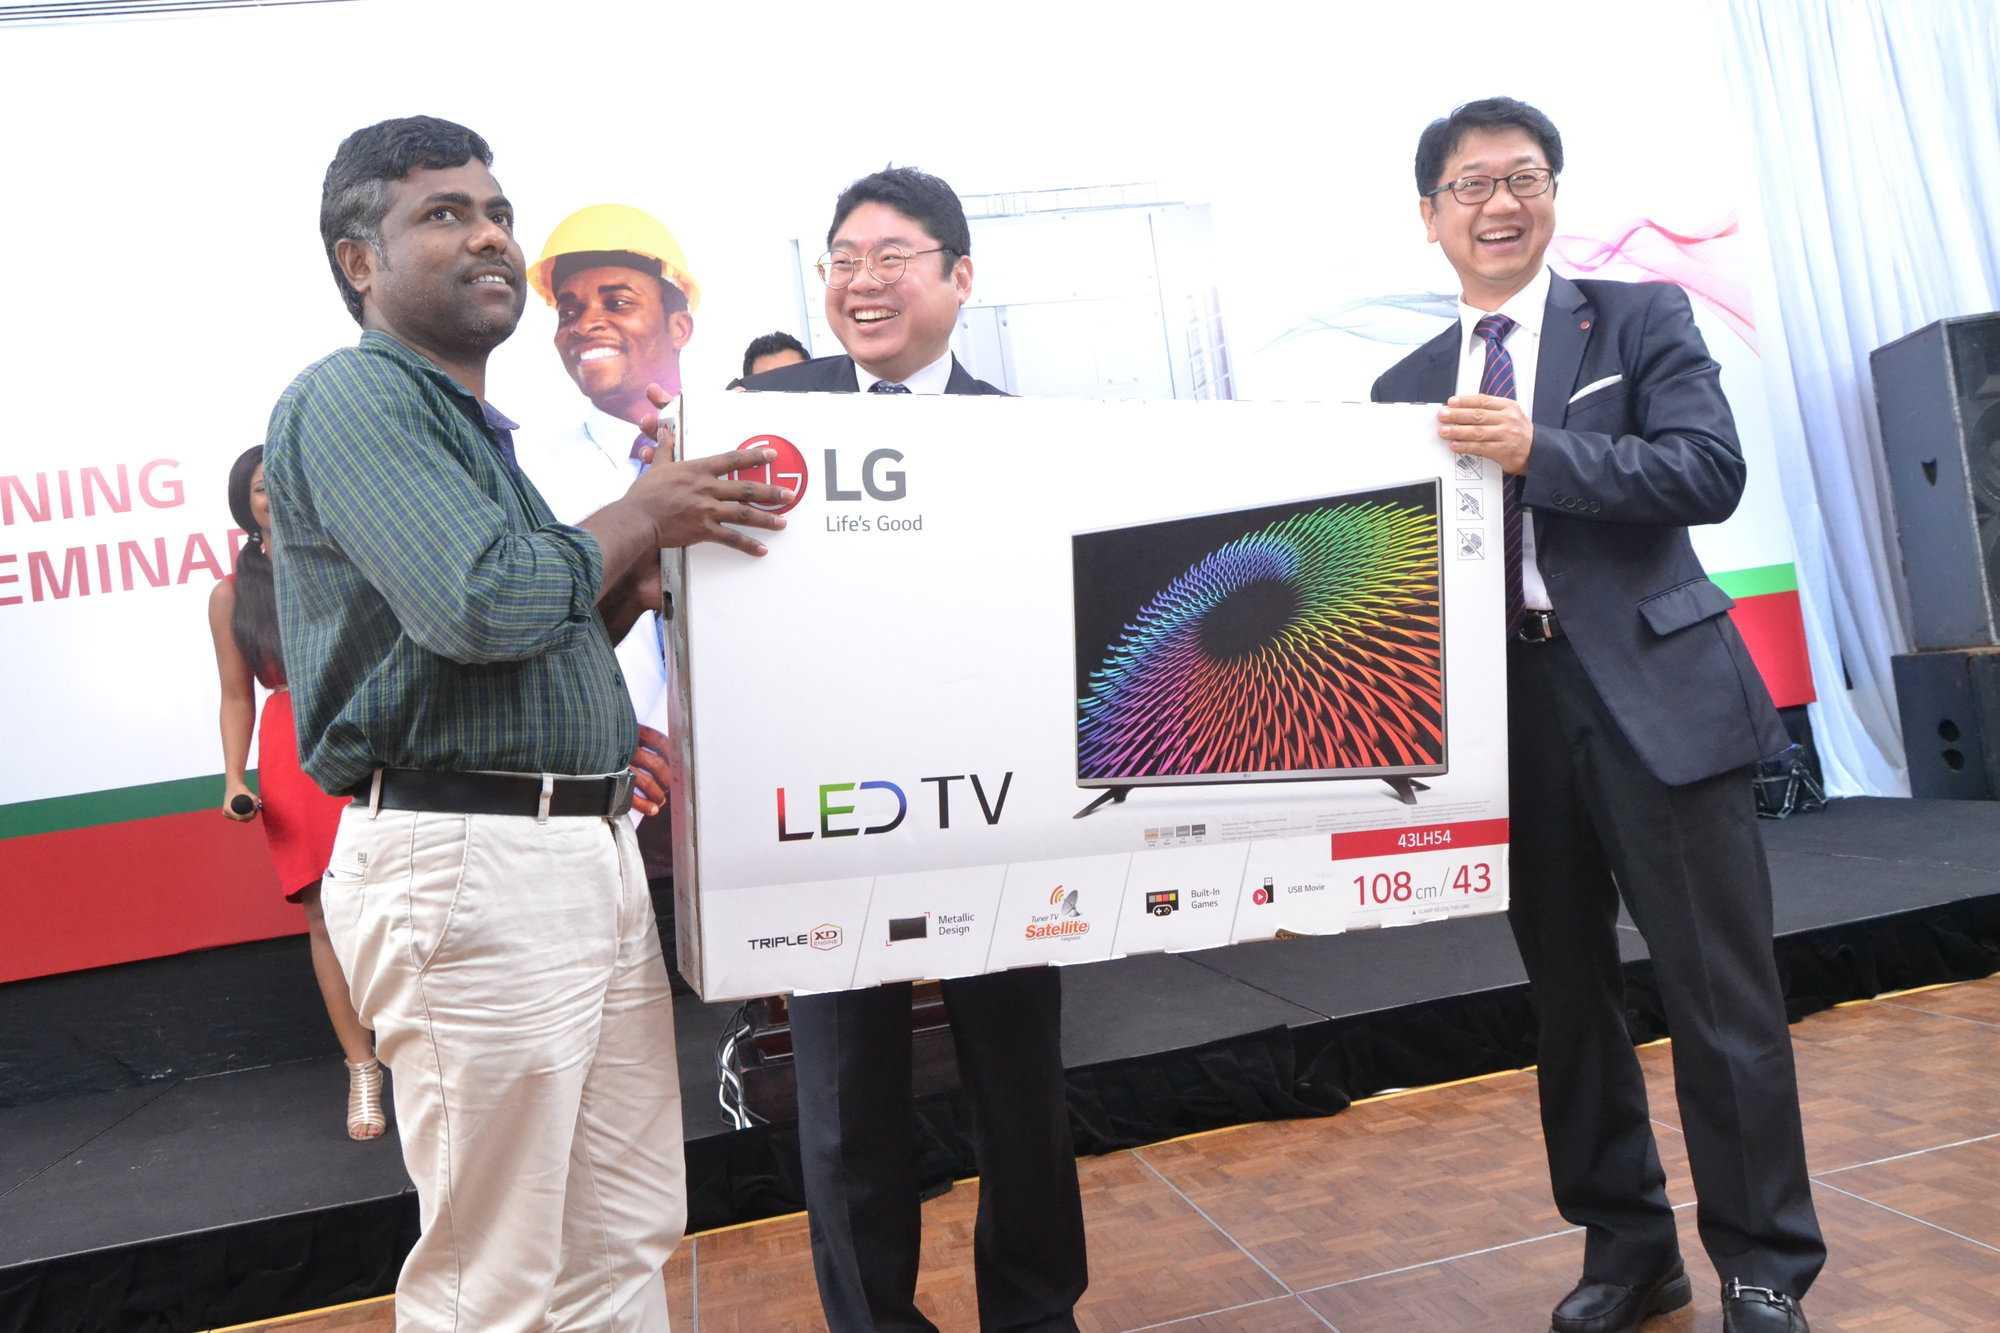 LG Event Photo 1.jpg